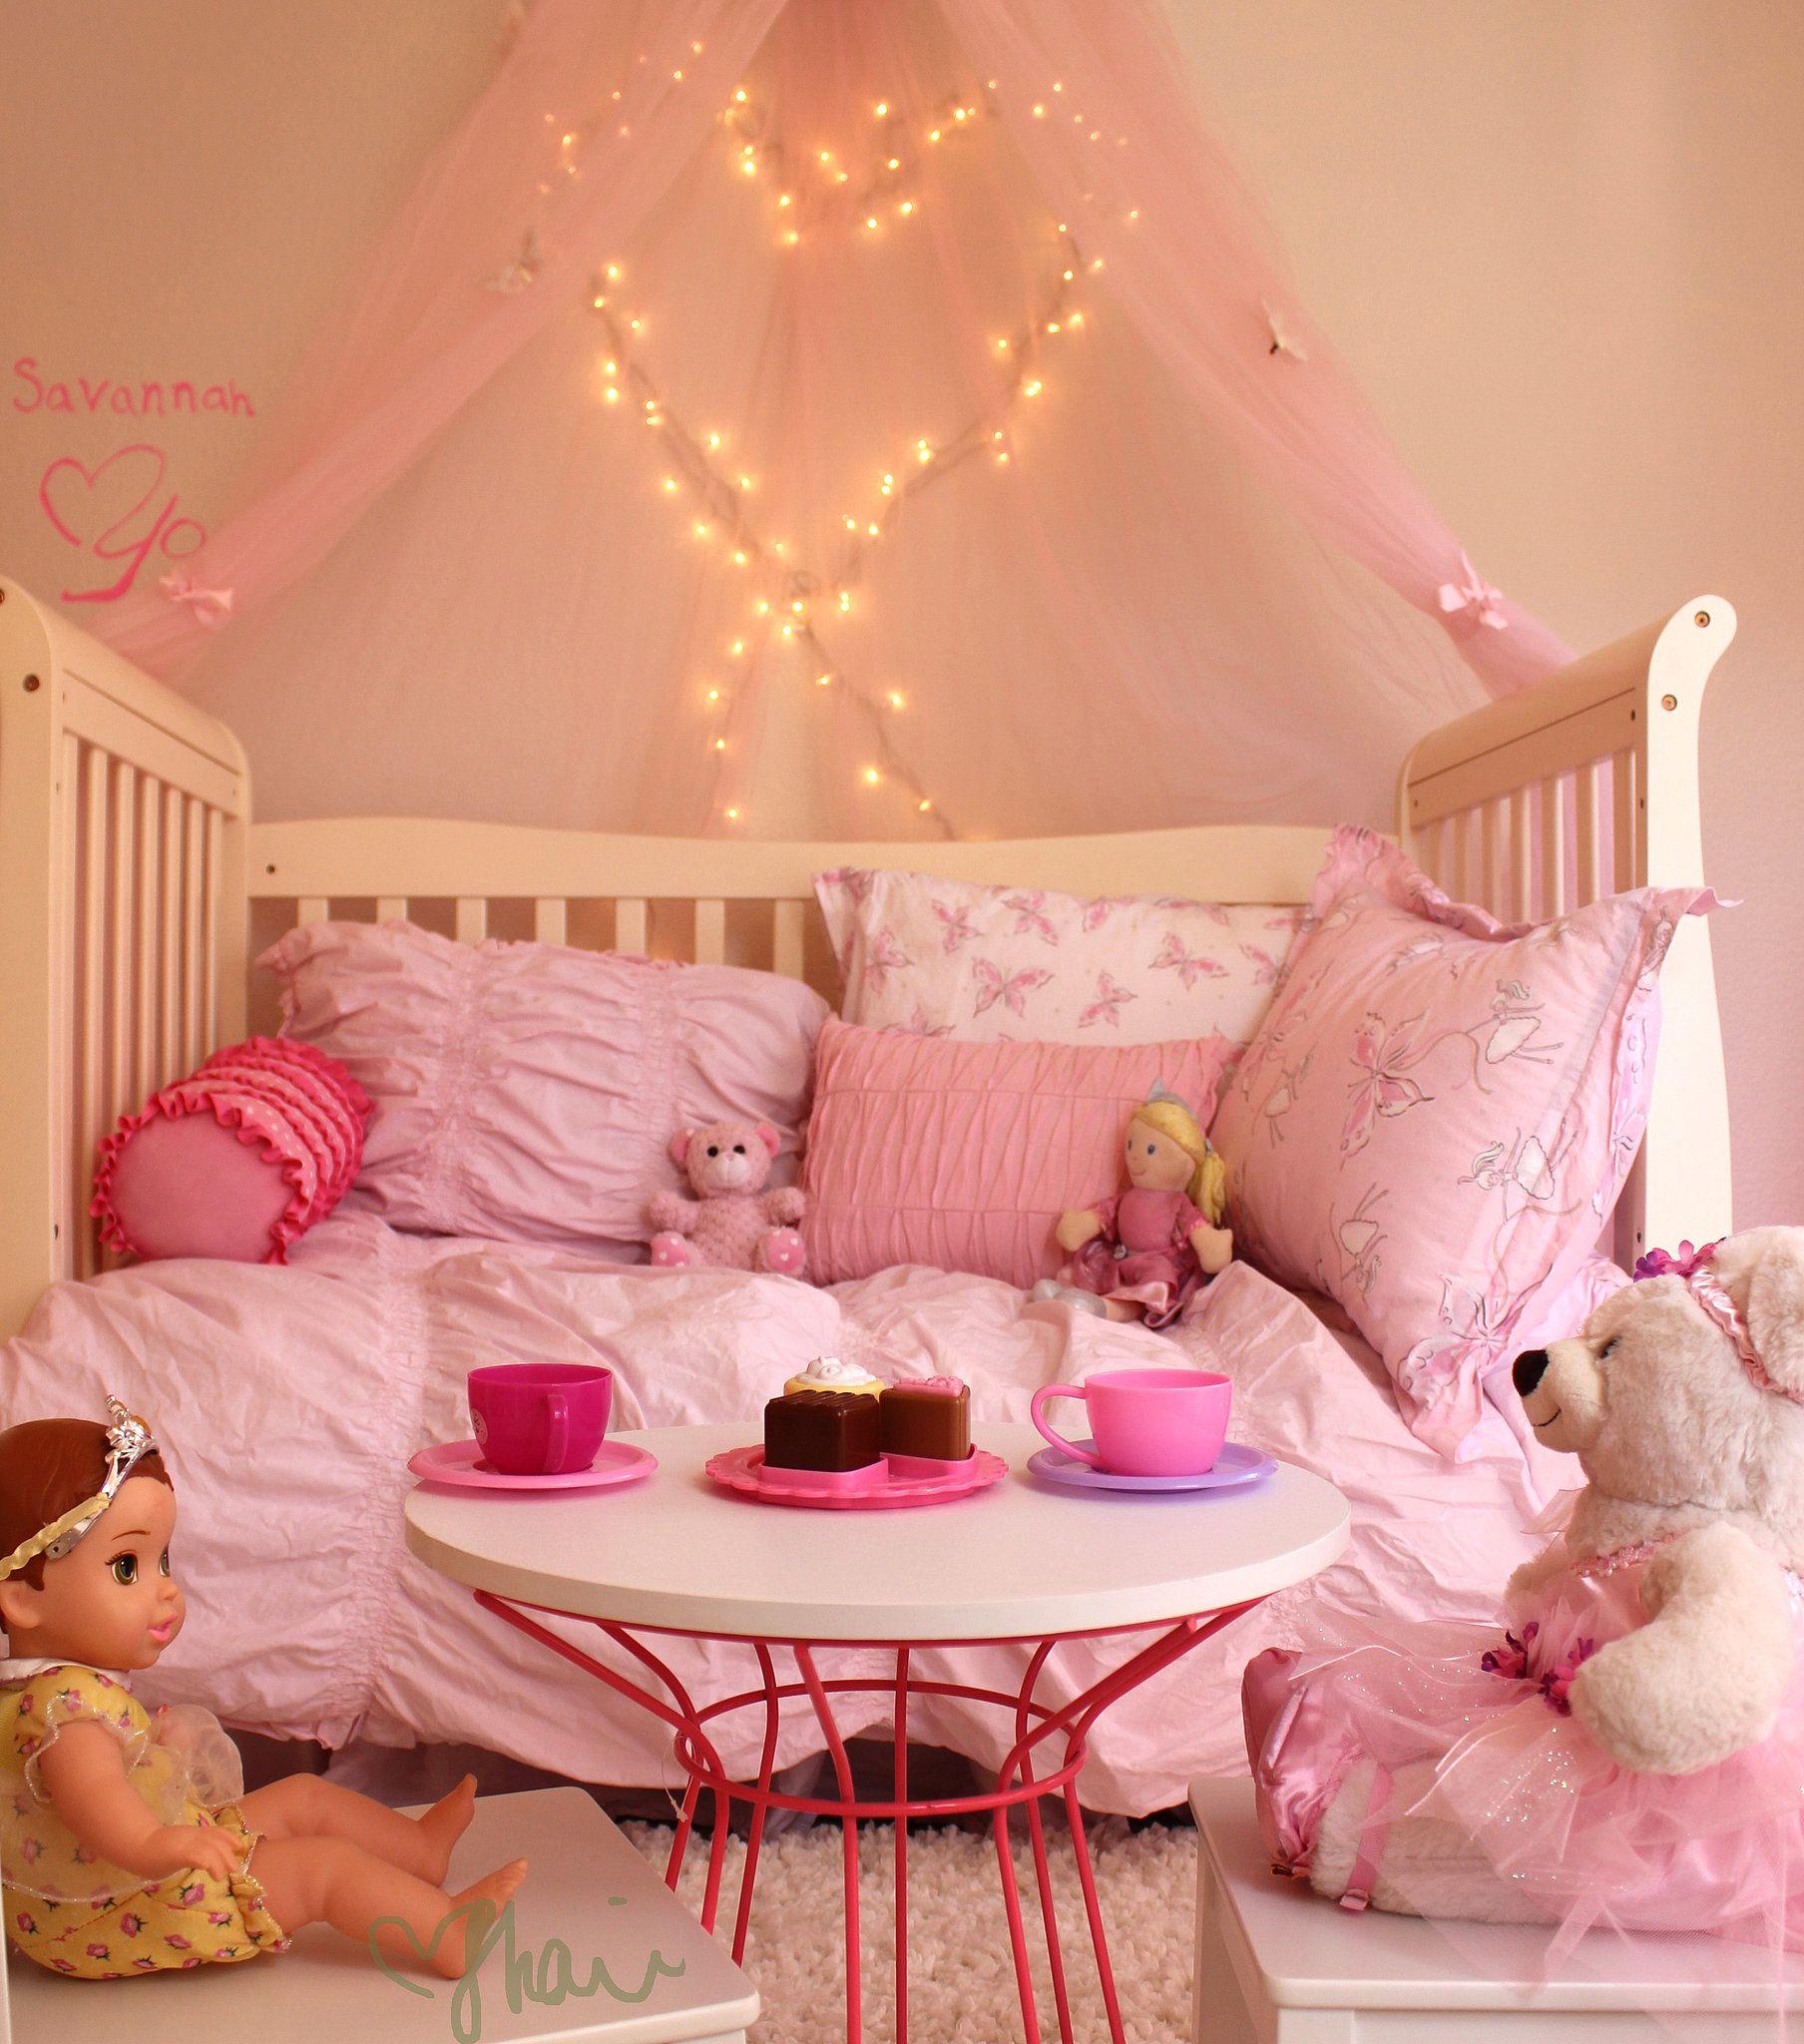 Tea Time Toddler rooms, Toddler room decor, Girl room